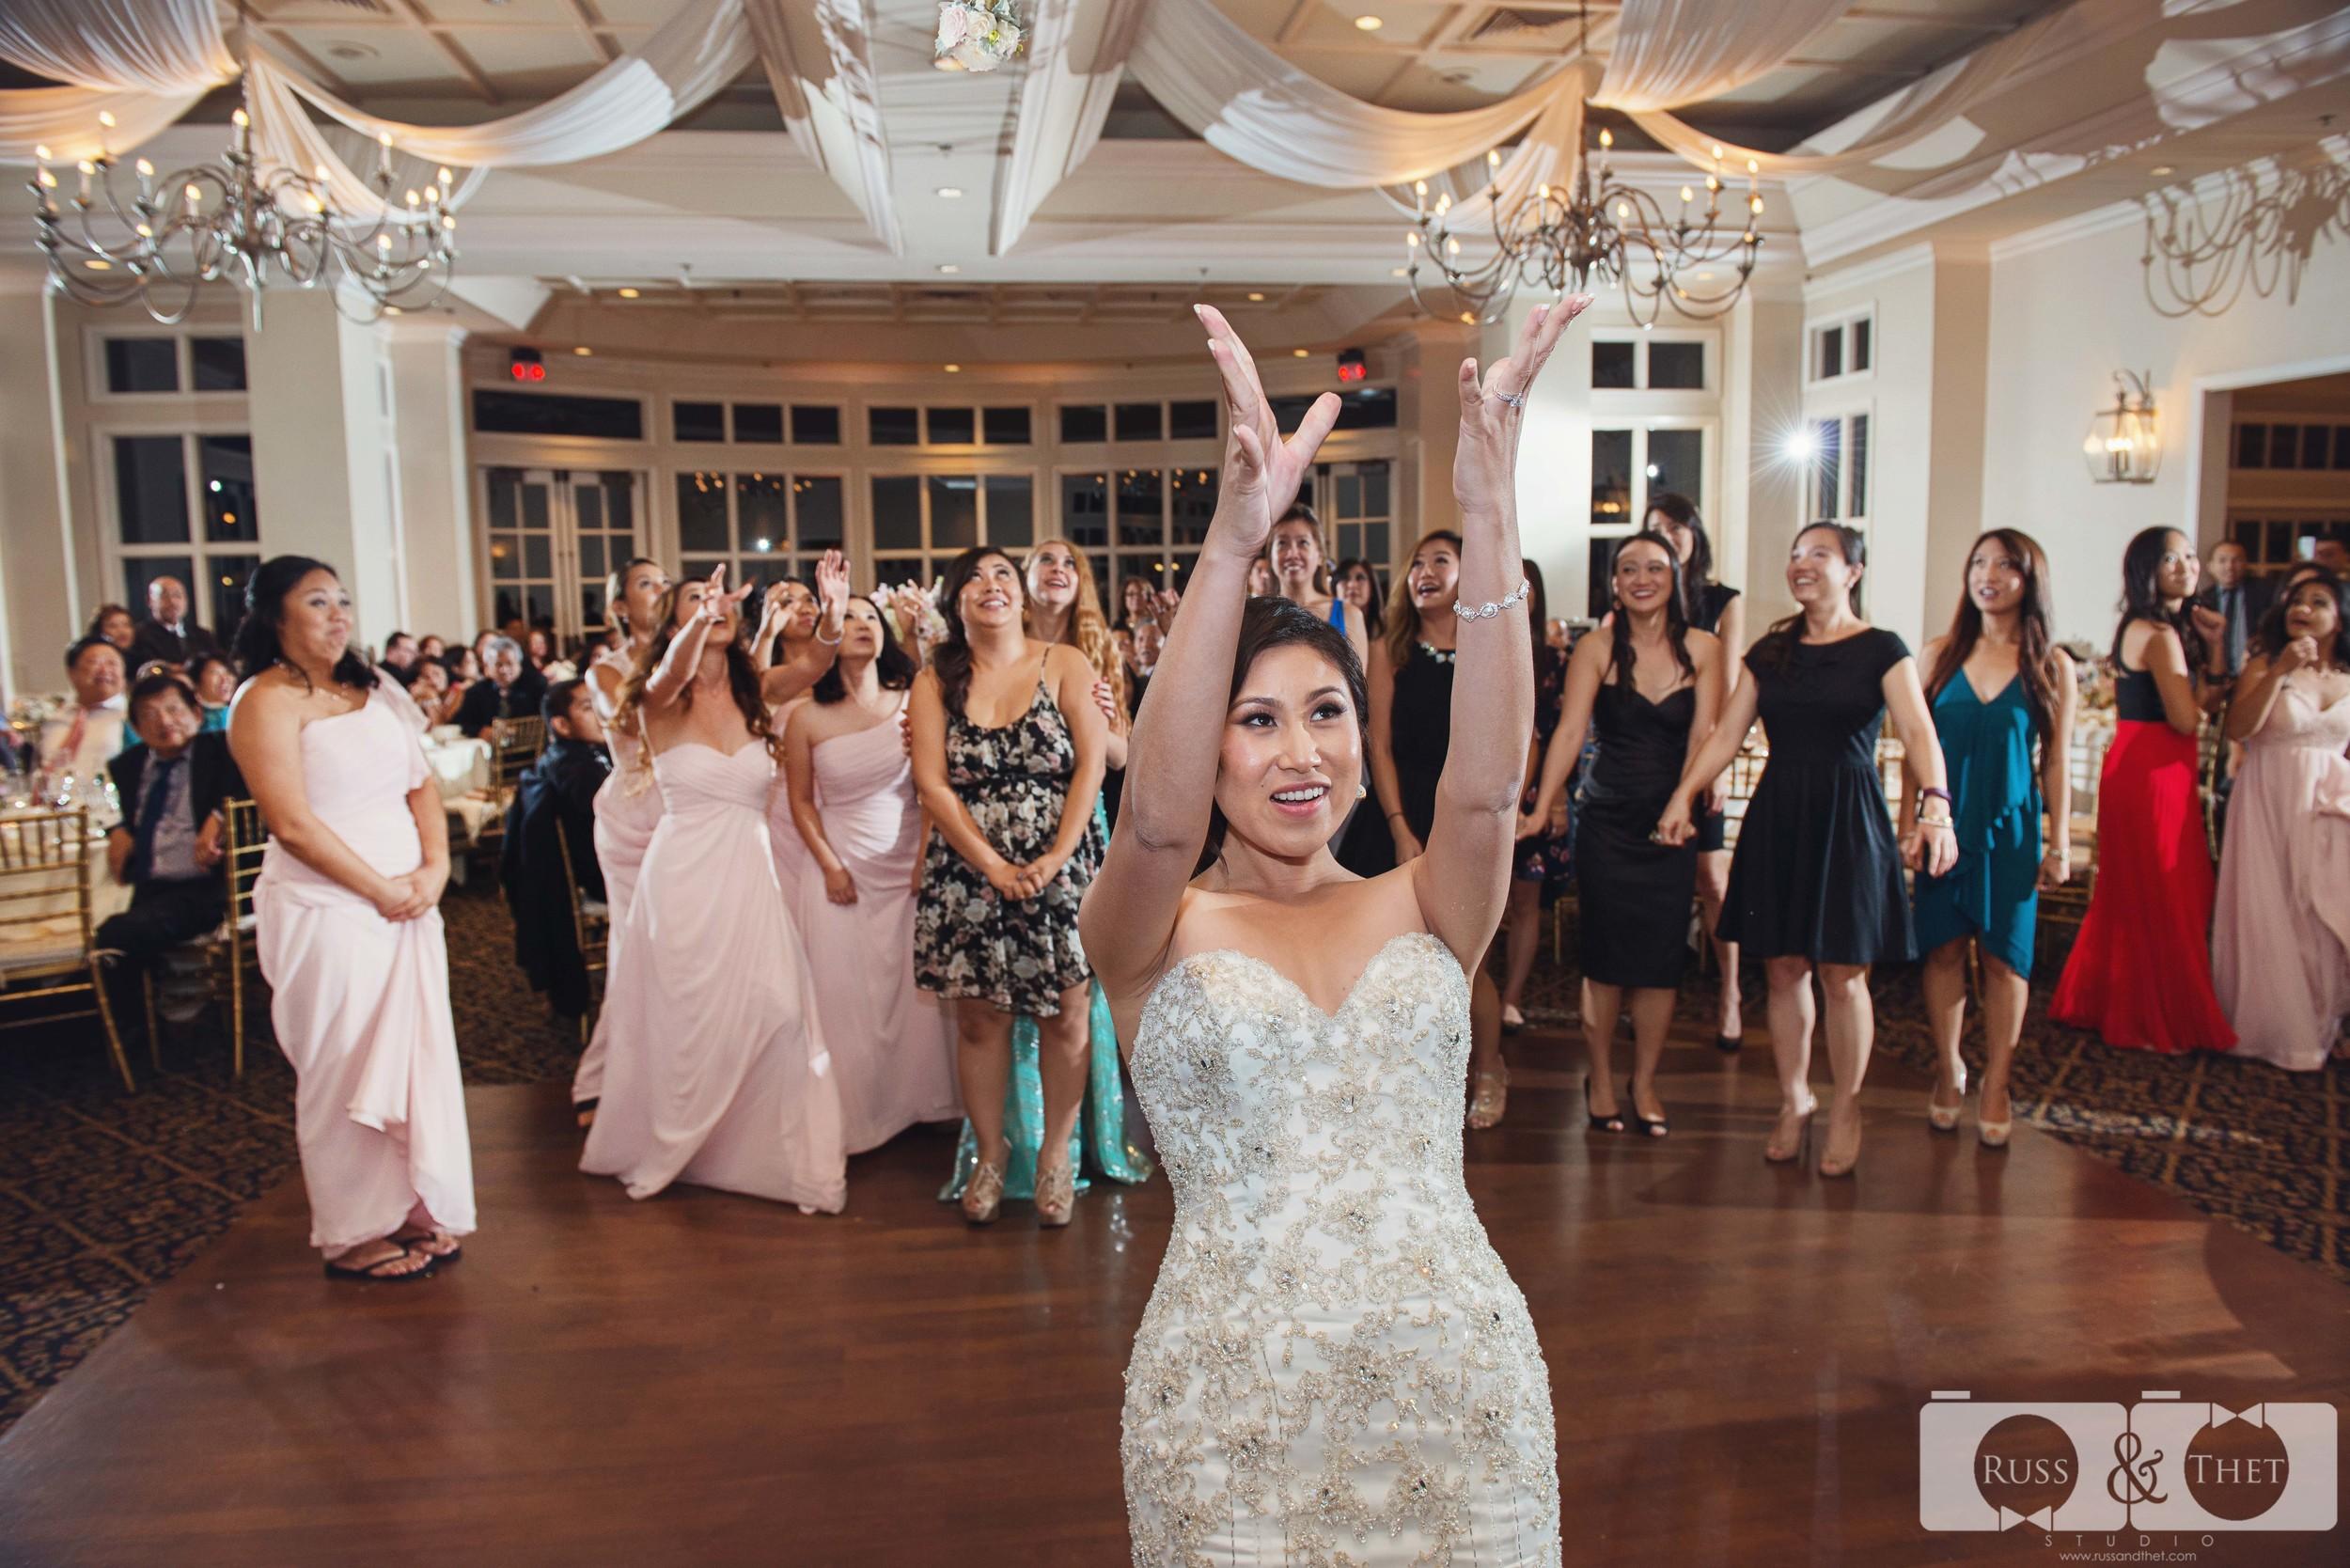 summit-house-fullerton-wedding-photographer-131.JPG